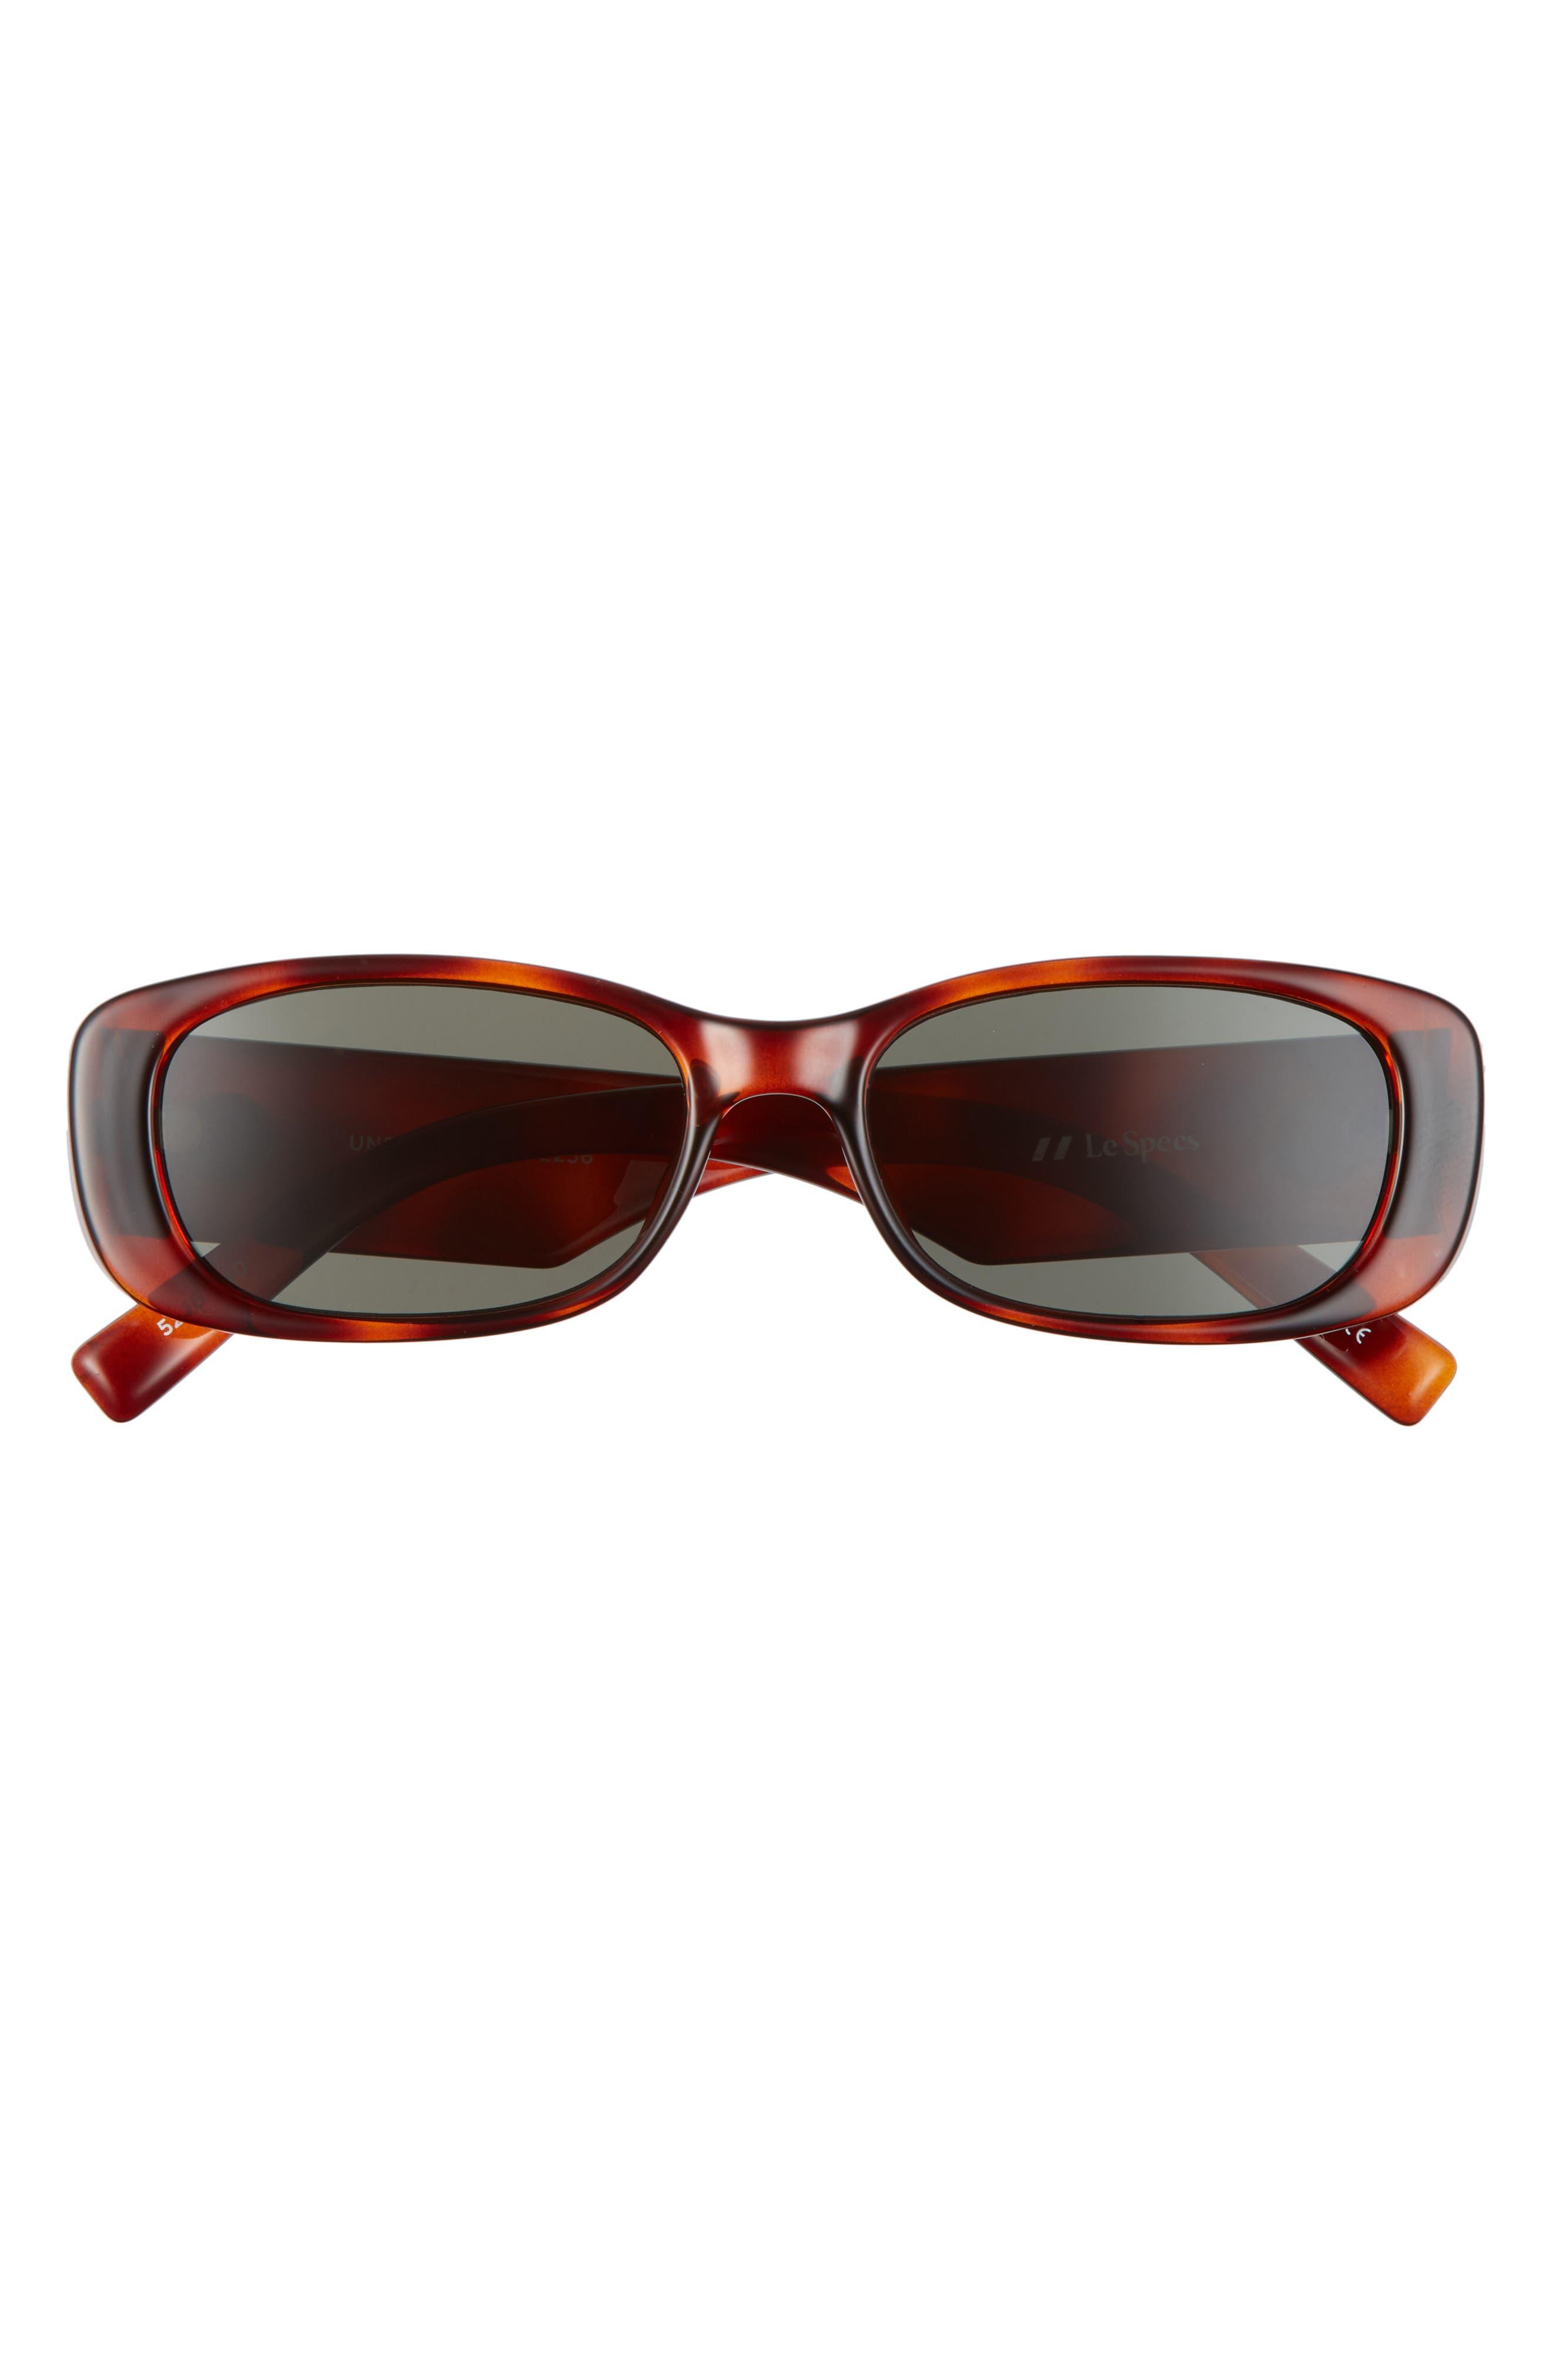 Unreal 52mm Rectangular Sunglasses